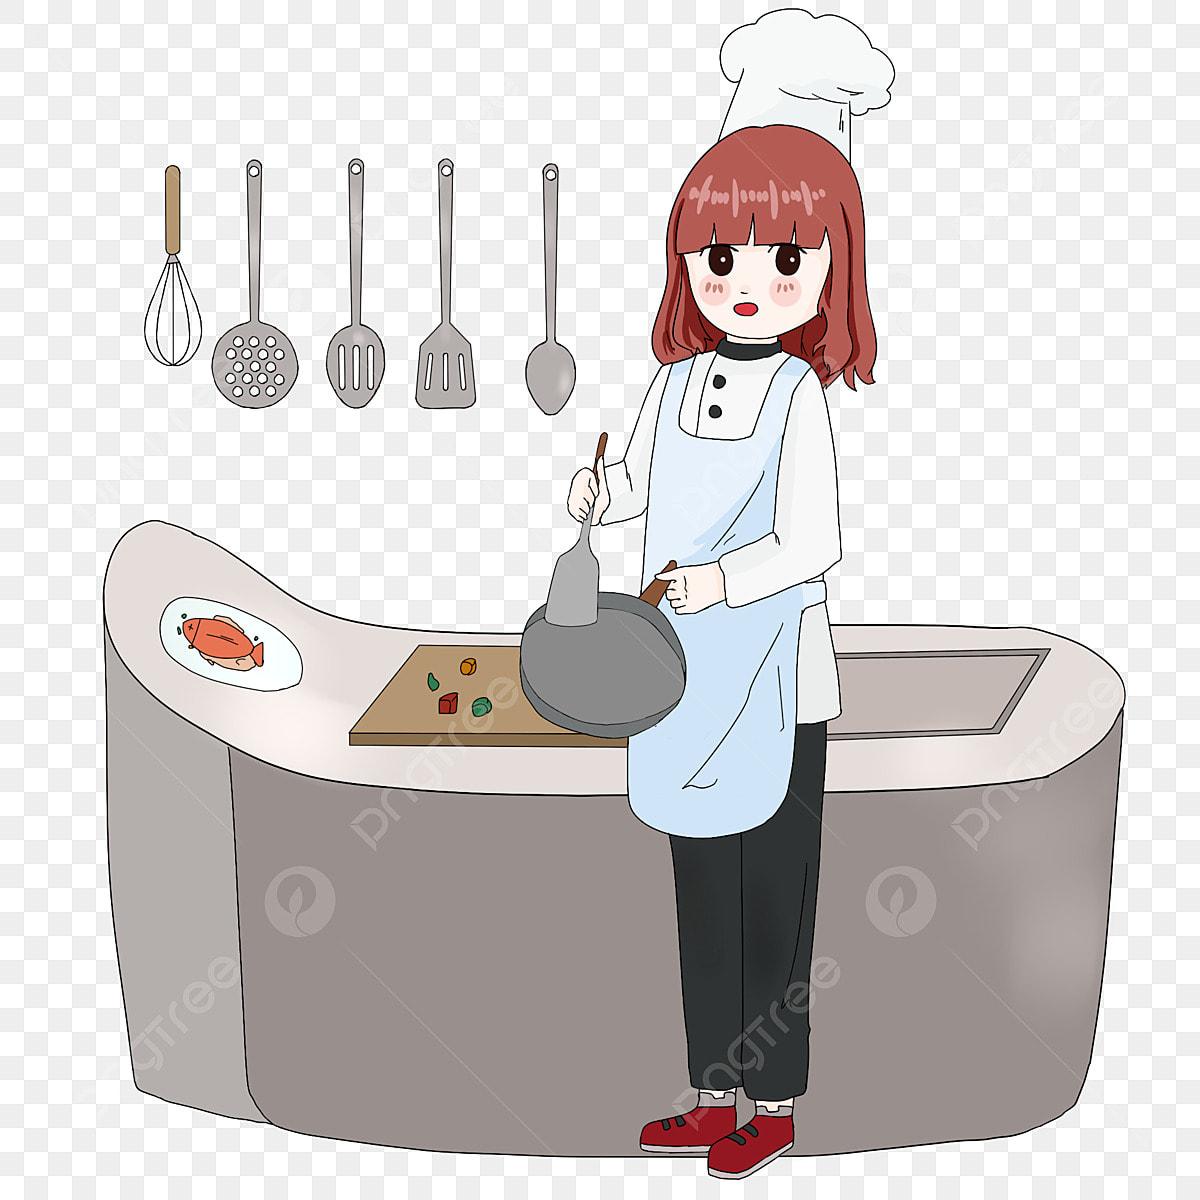 la beaut u00e9 de la cuisini u00e8re personnage dessin cuisinier png